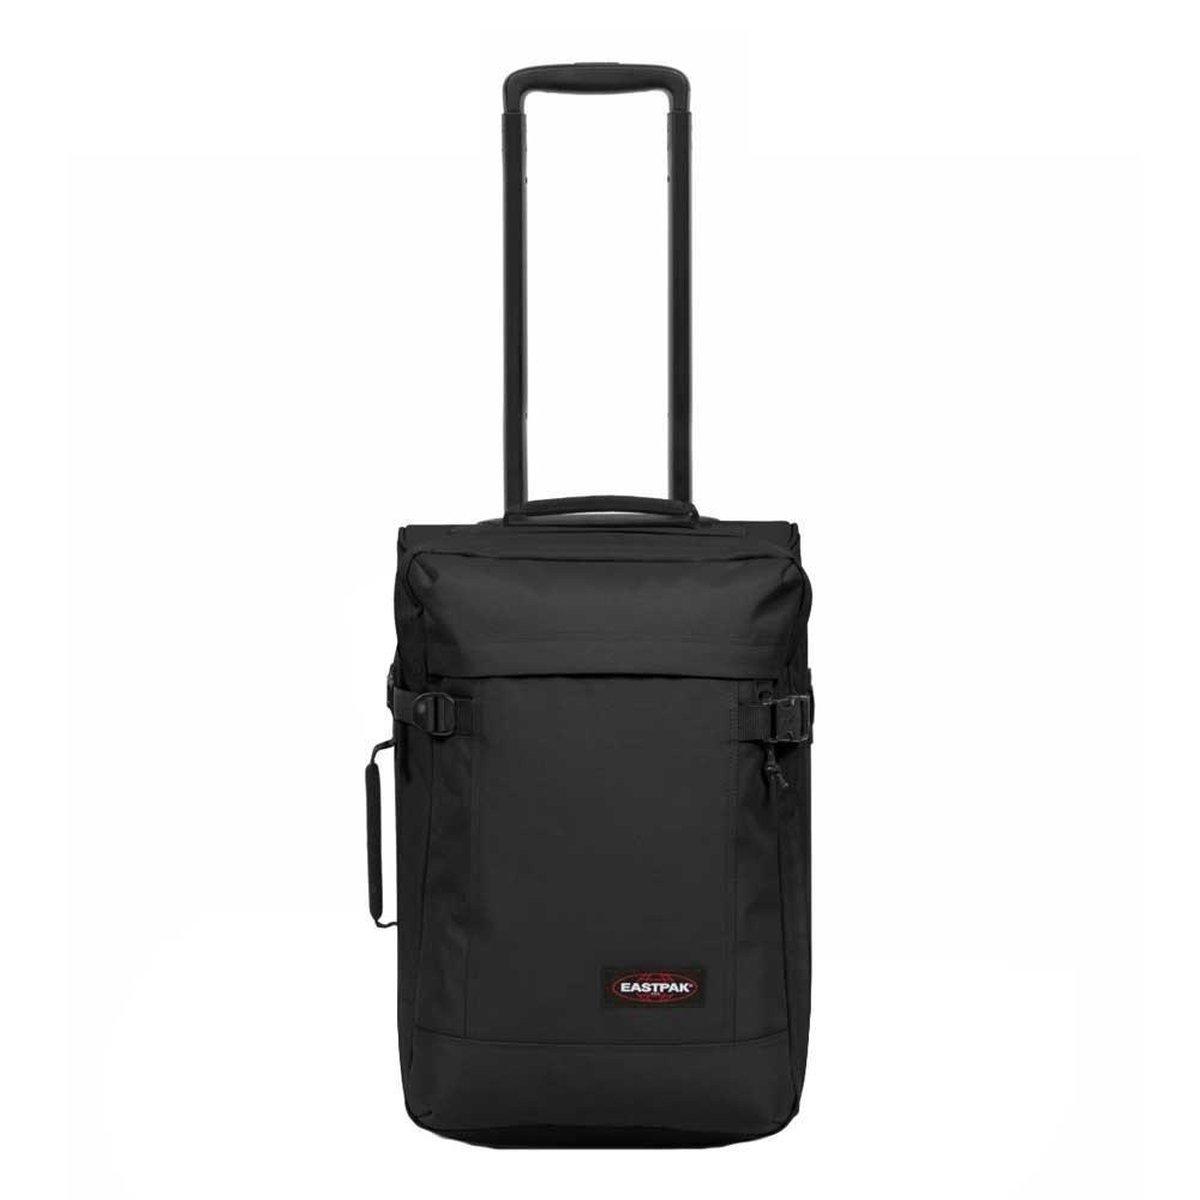 Eastpak Tranverz XS Handbagage Reiskoffer 48 cm - Black